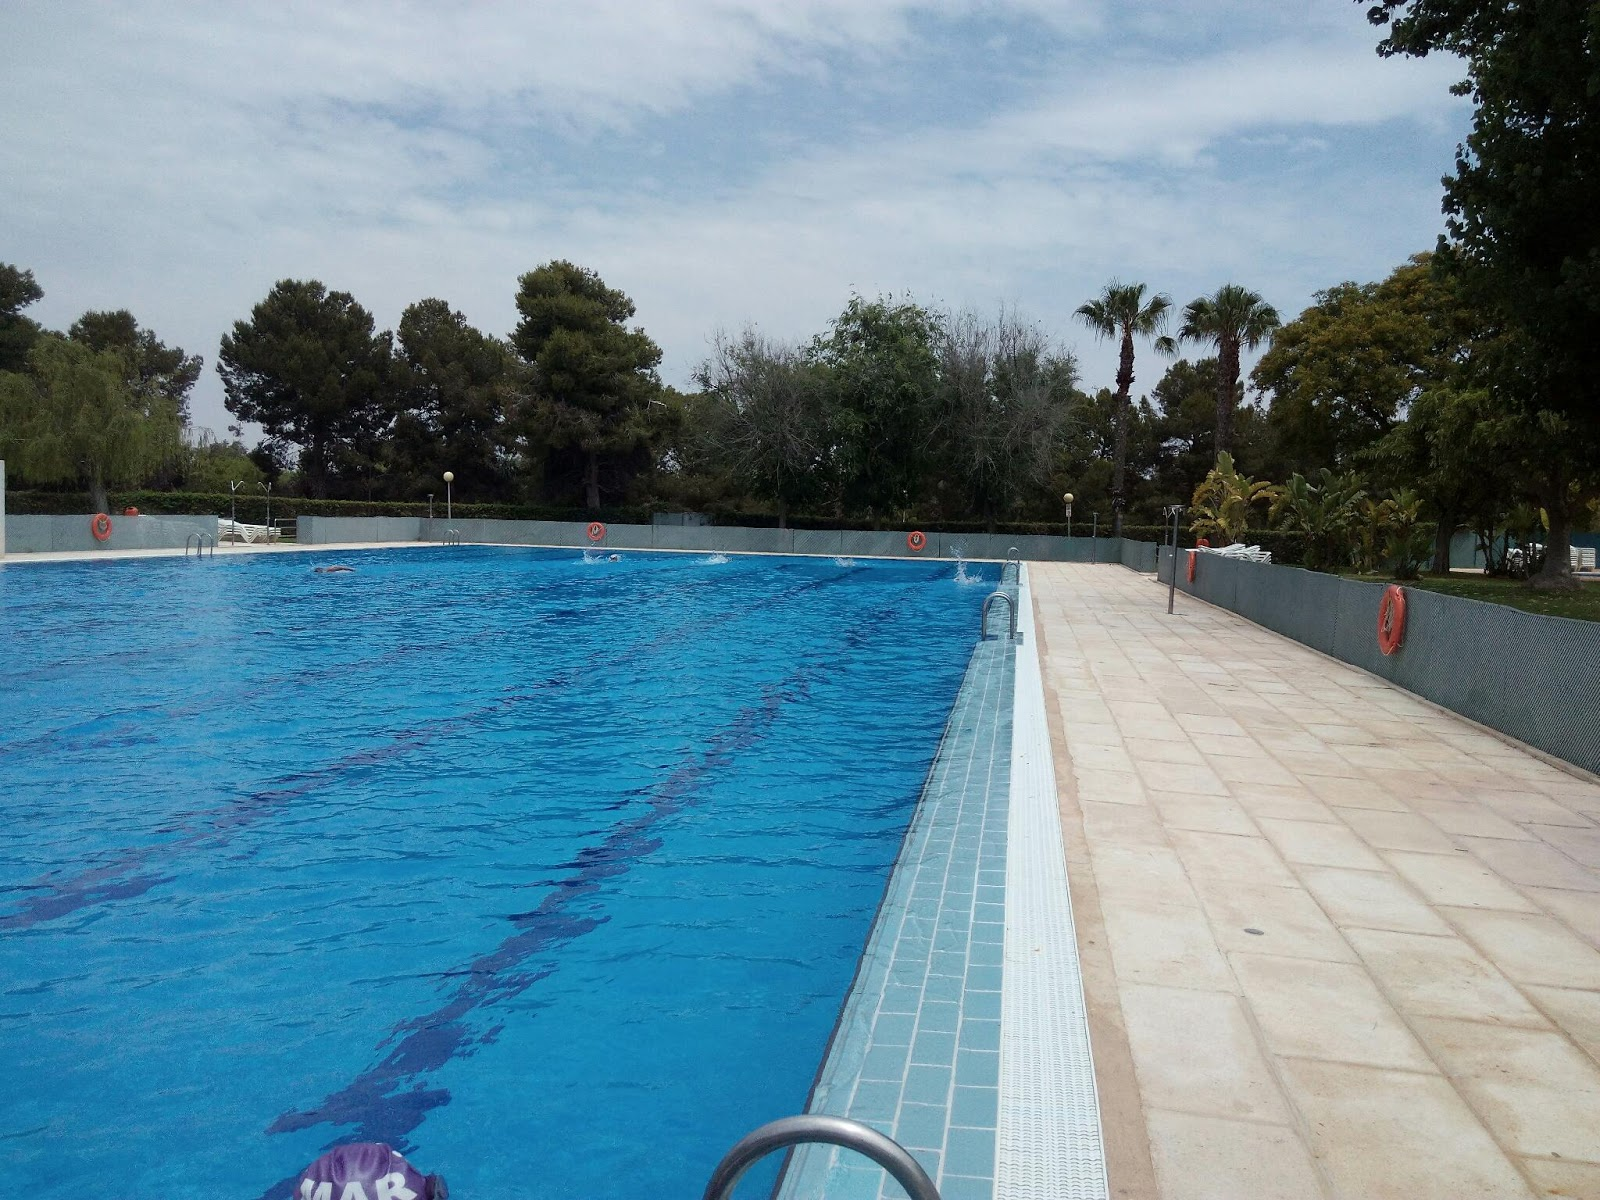 Club atletismo mandarache nataci n por relevos santa ana for Metros piscina olimpica